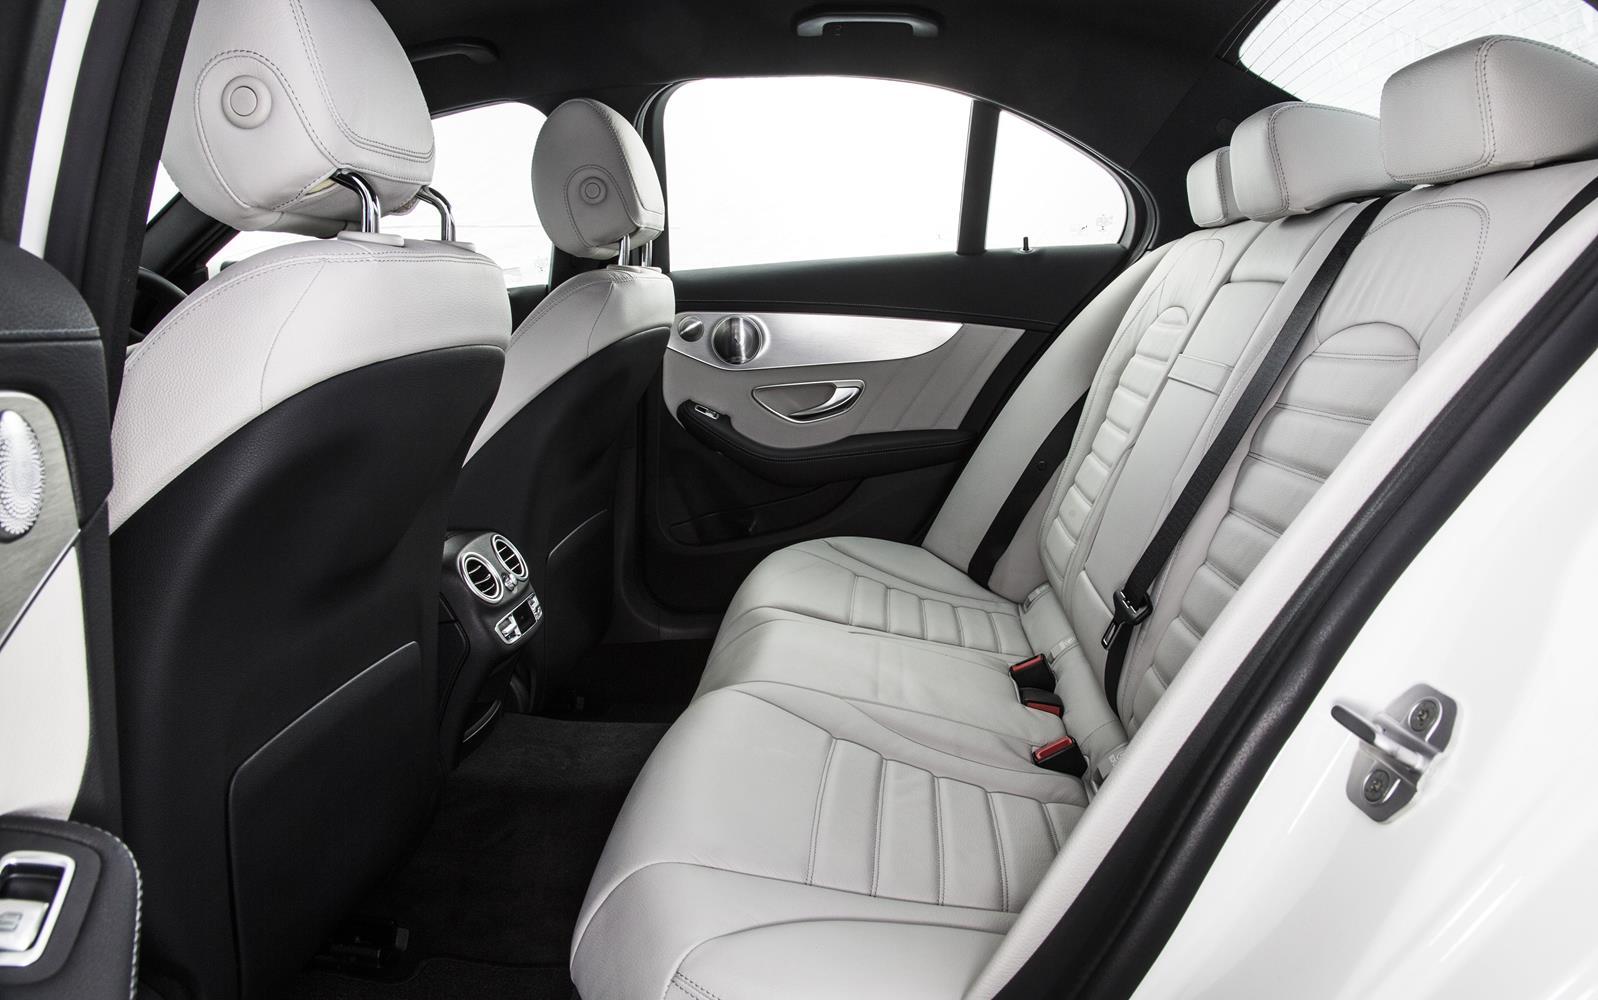 Mercedes C Class Salooon 2014 Rear Seats Frontseatdriver